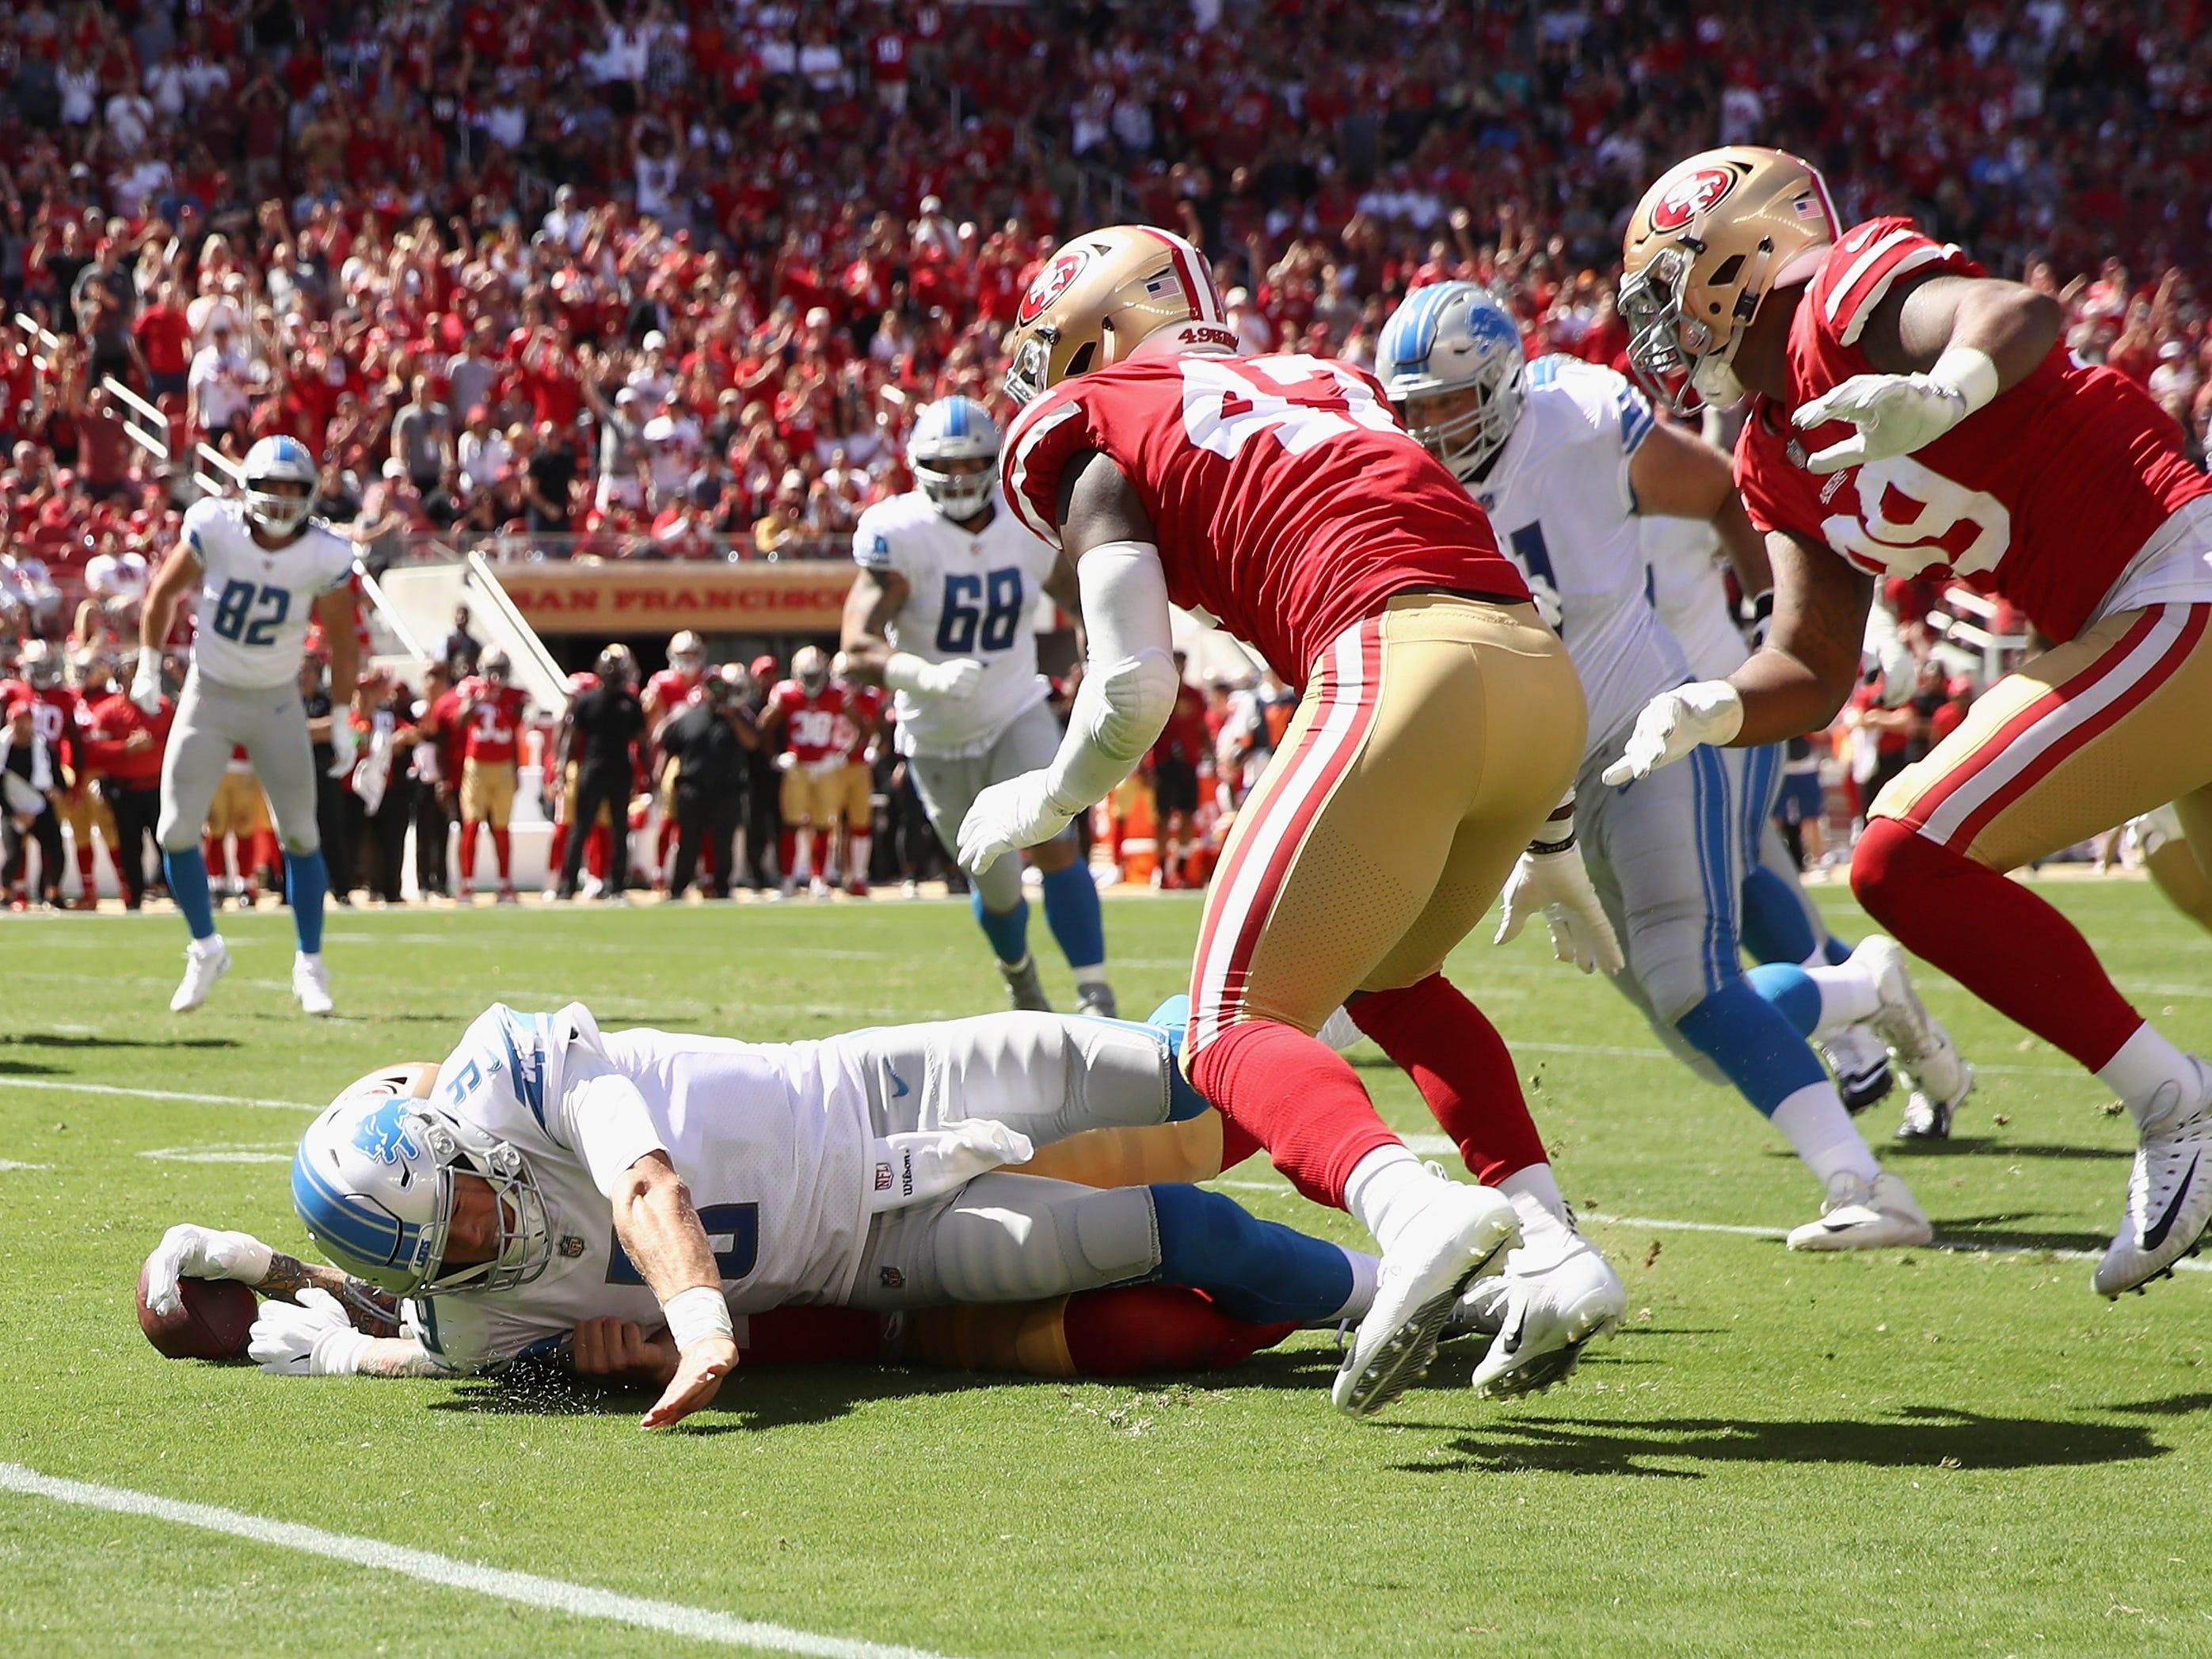 Detroit Lions QB Matthew Stafford fumbles the ball against the San Francisco 49ers at Levi's Stadium on Sept. 16, 2018 in Santa Clara, Calif.